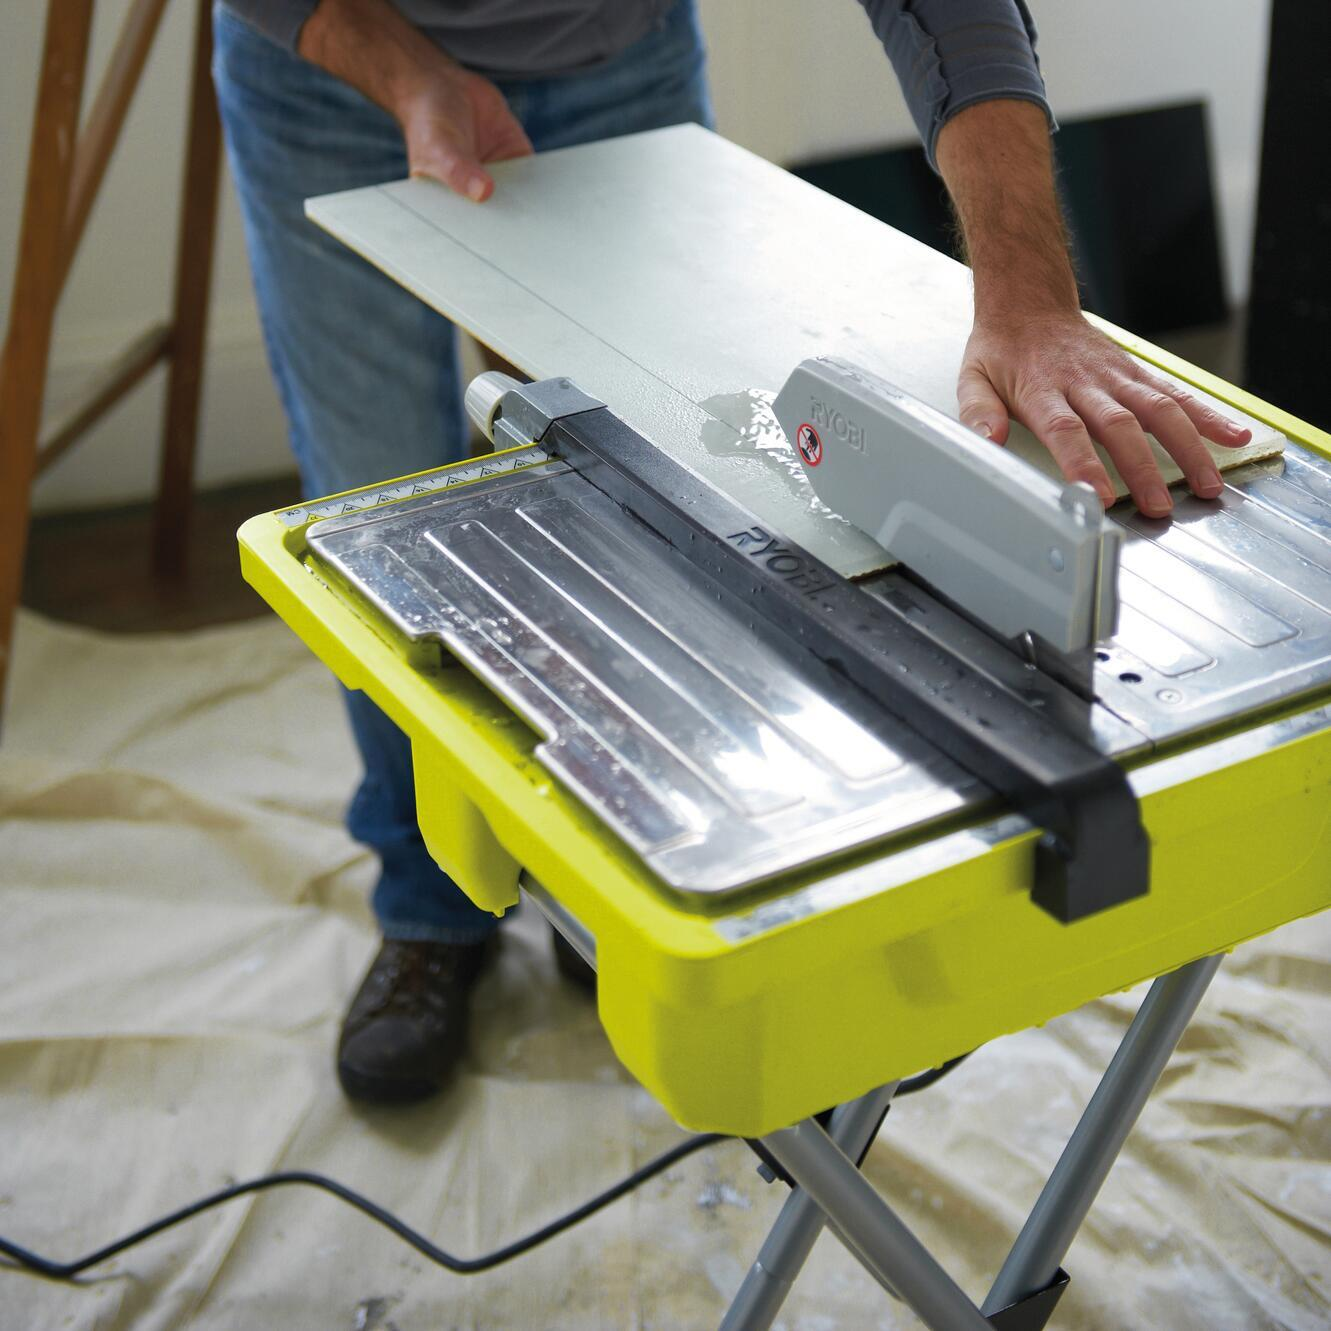 Tagliapiastrelle elettrica RYOBI Ø disco 178 mm, H taglio 33 mm, 500 W - 5